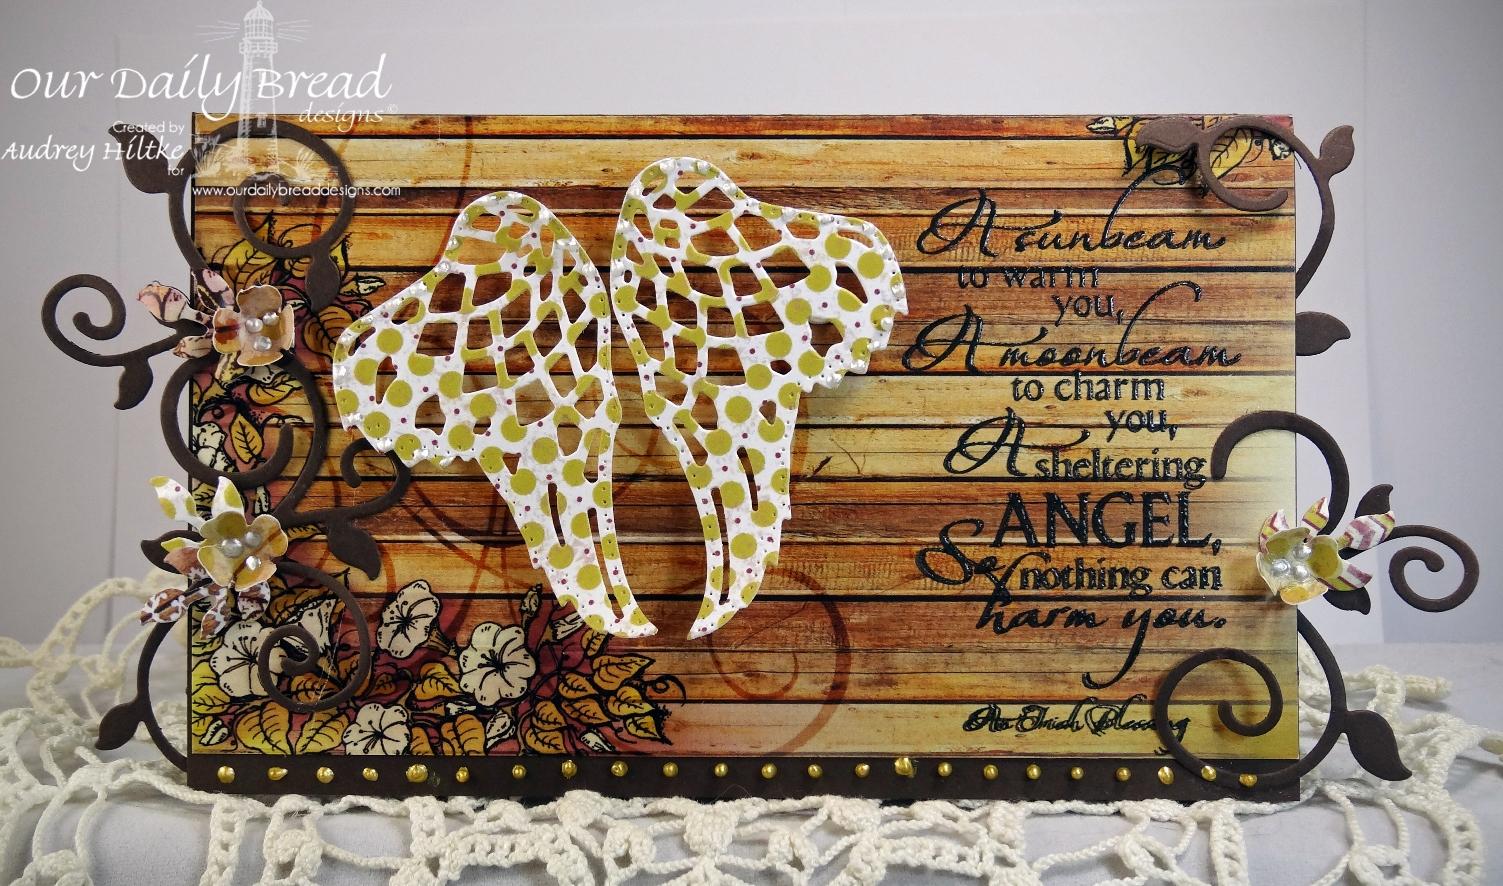 Stamps - Our Daily Bread Designs Sheltering Angel, ODBD Rustic Beauty Paper Collection, ODBD Custom Angel Wings Die, ODBD Custom Ornamental Crosses Die, ODBD Custom Fancy Foliage Die